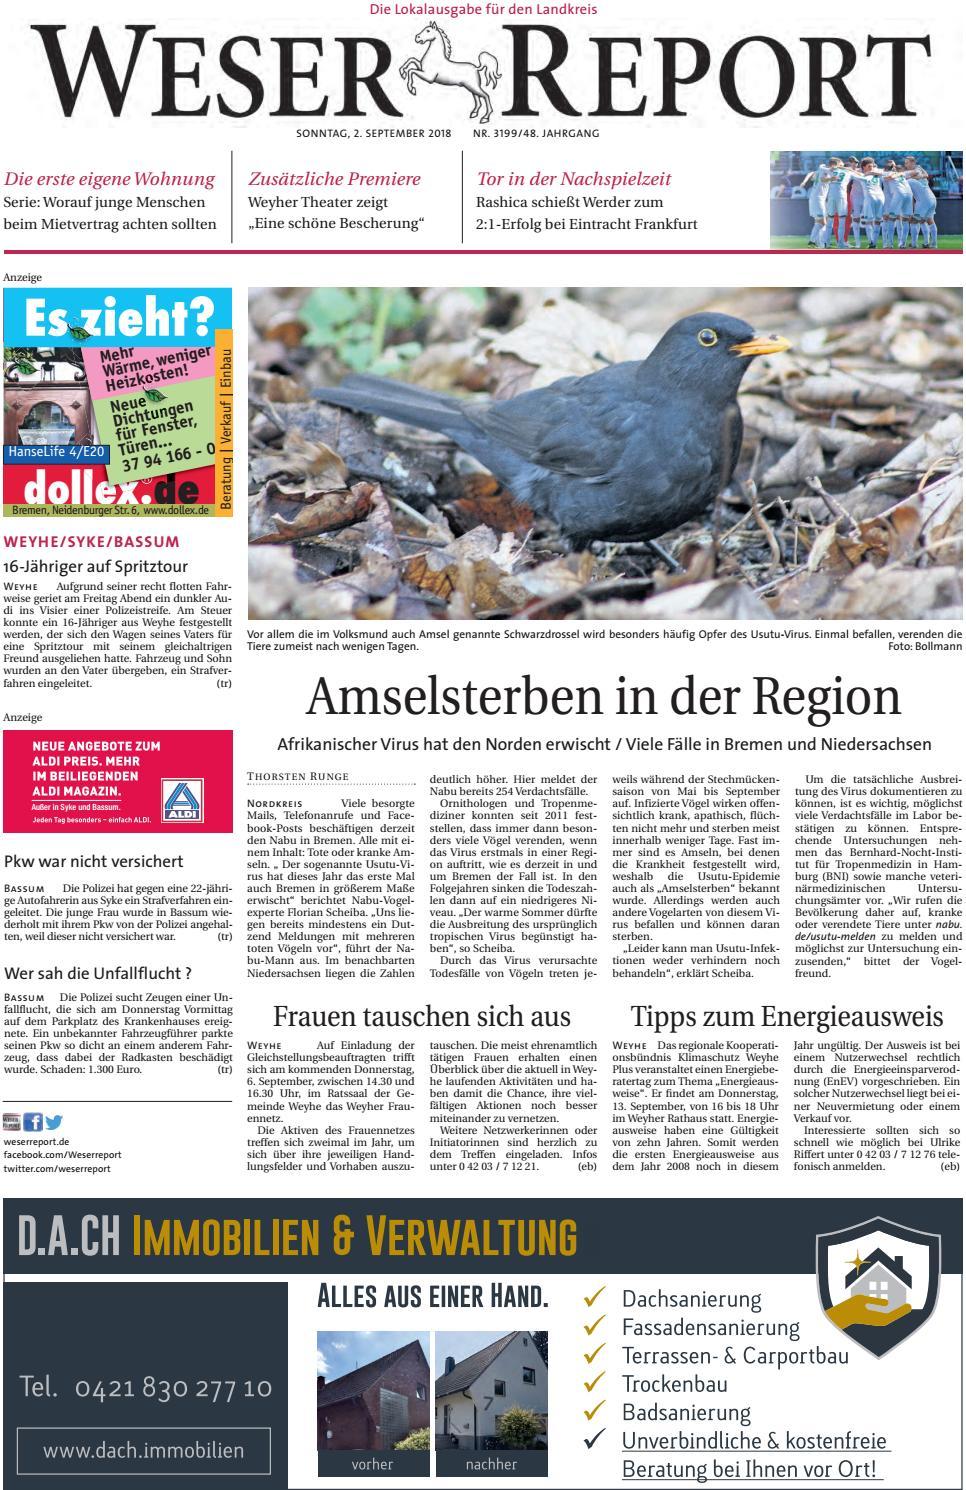 Weser Report - Weyhe, Syke, Bassum vom 02.09.2018 by KPS  Verlagsgesellschaft mbH - issuu